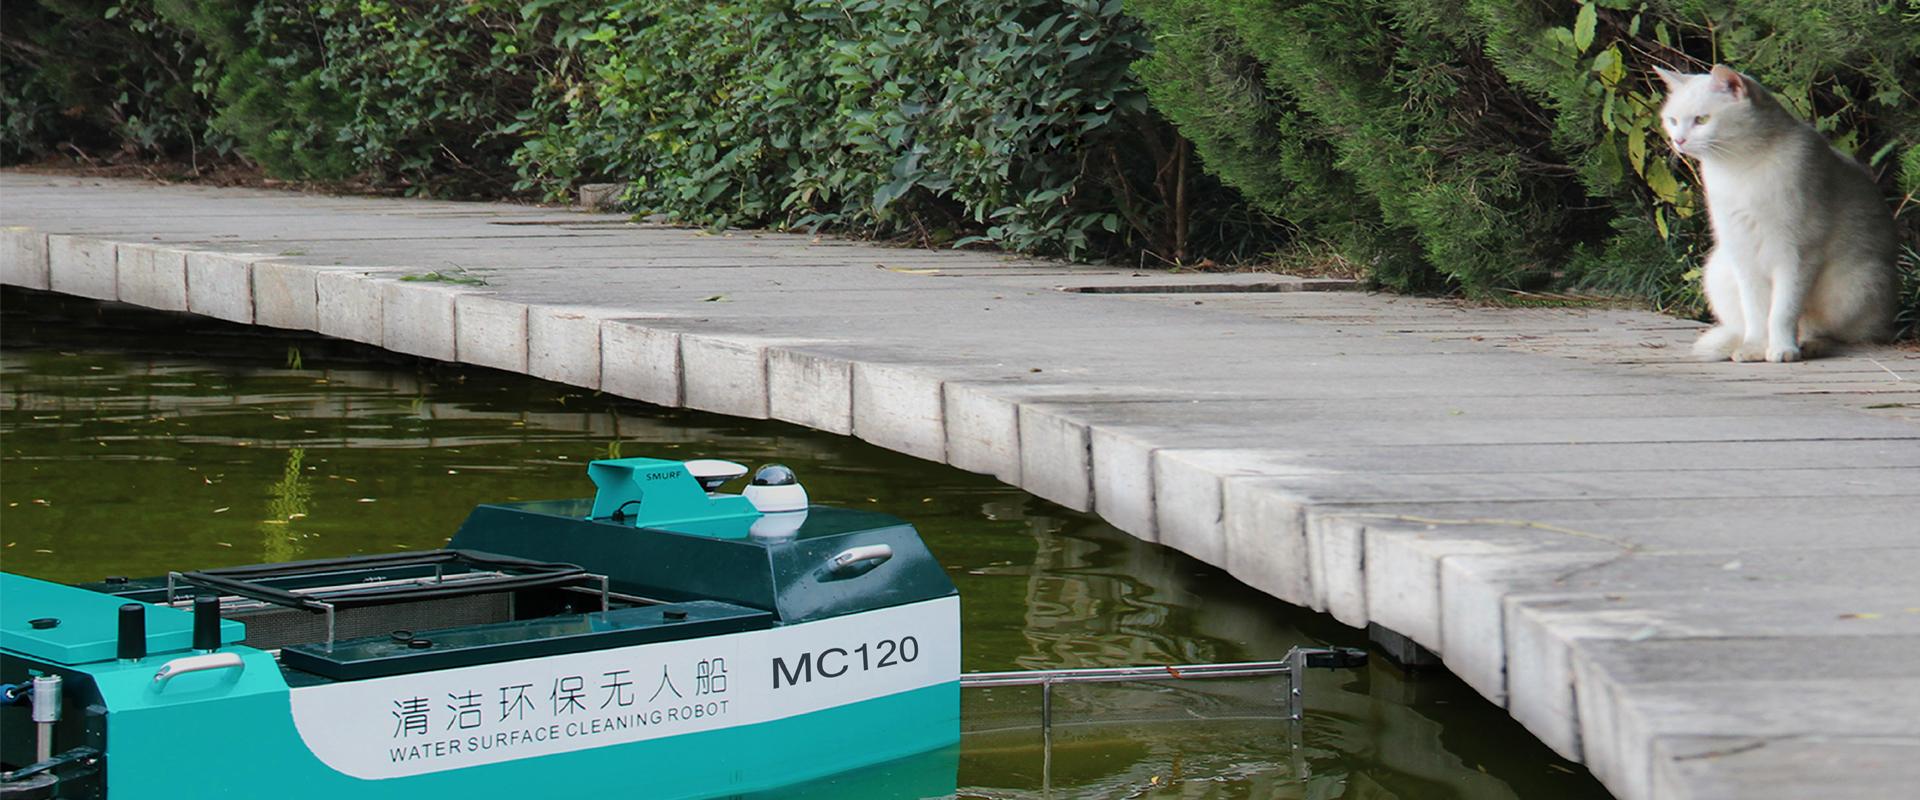 MC120